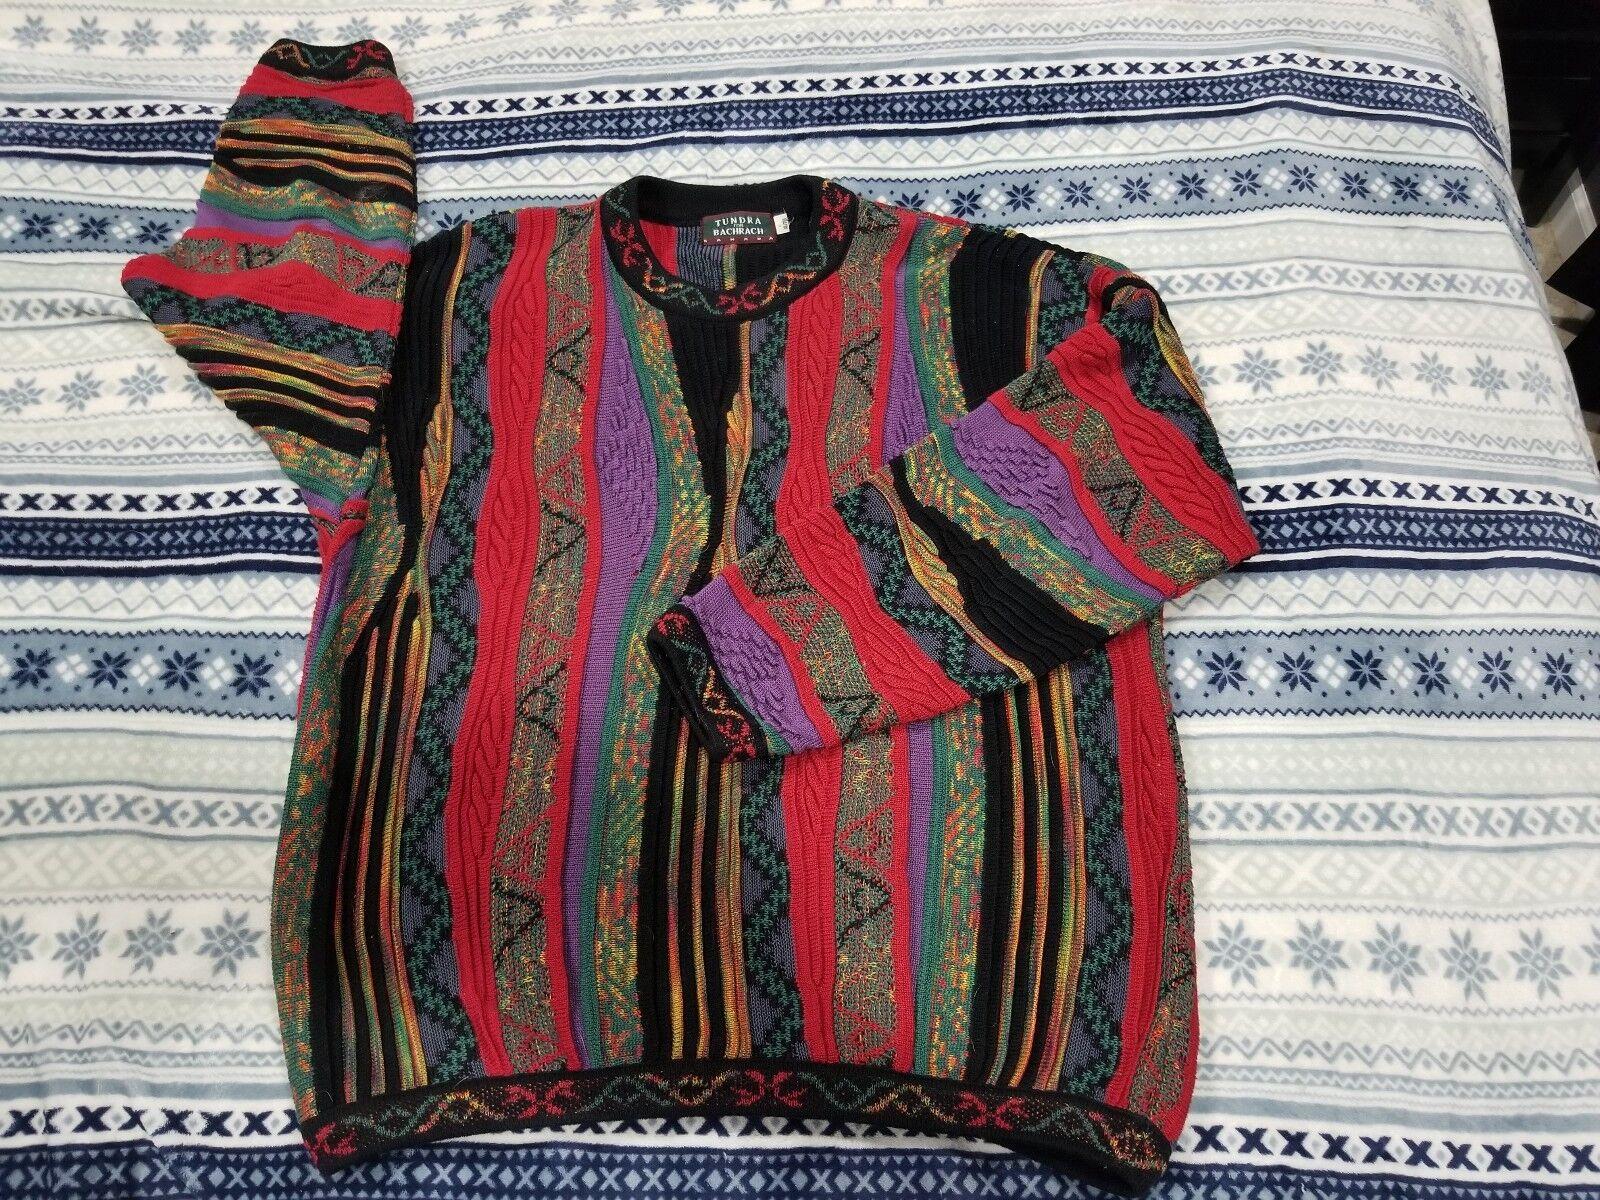 XL Tundra Bachrach Sweater Coogi Wild 90s Biggie Hip Hop 100% Mercerized Cotton